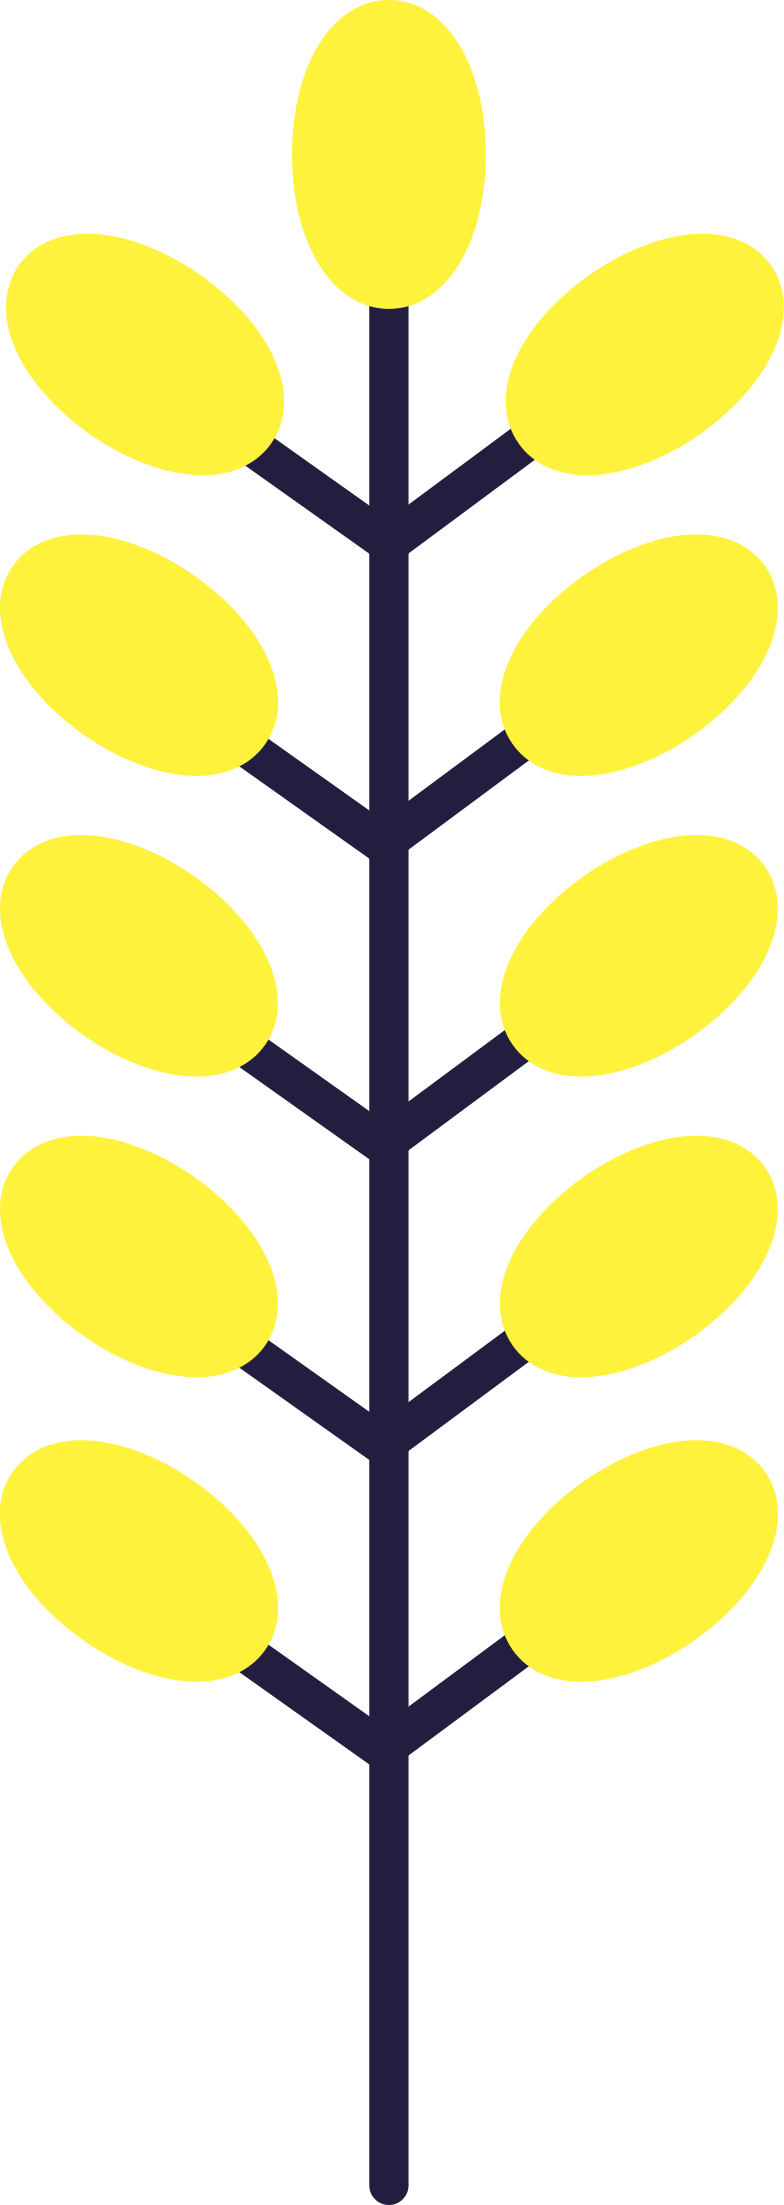 spica Clipart illustration in PNG, SVG